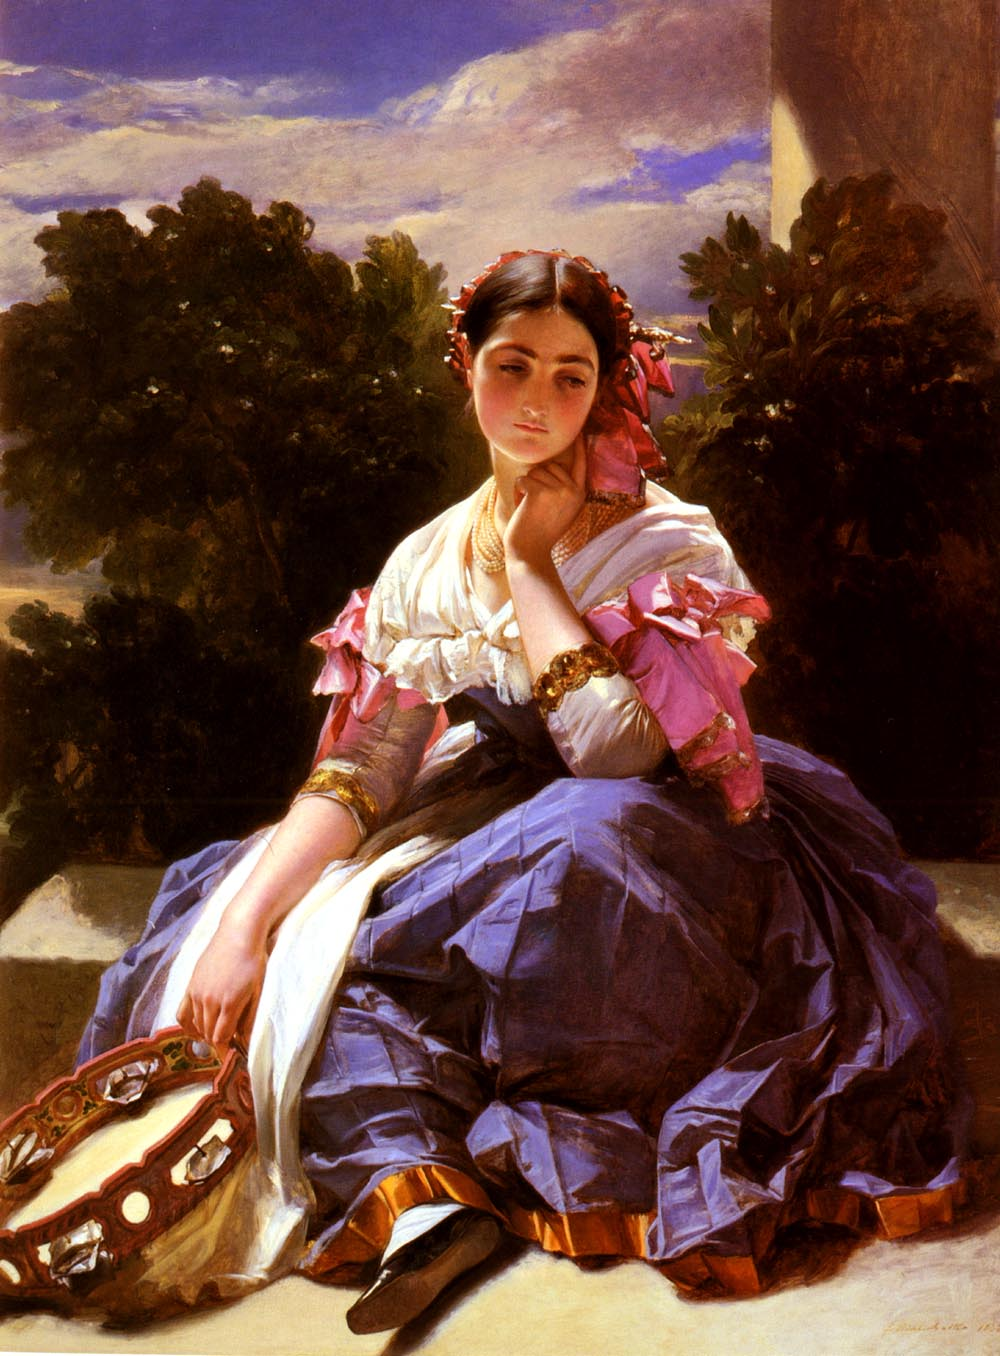 1000+ images about Painterly portrait on Pinterest.